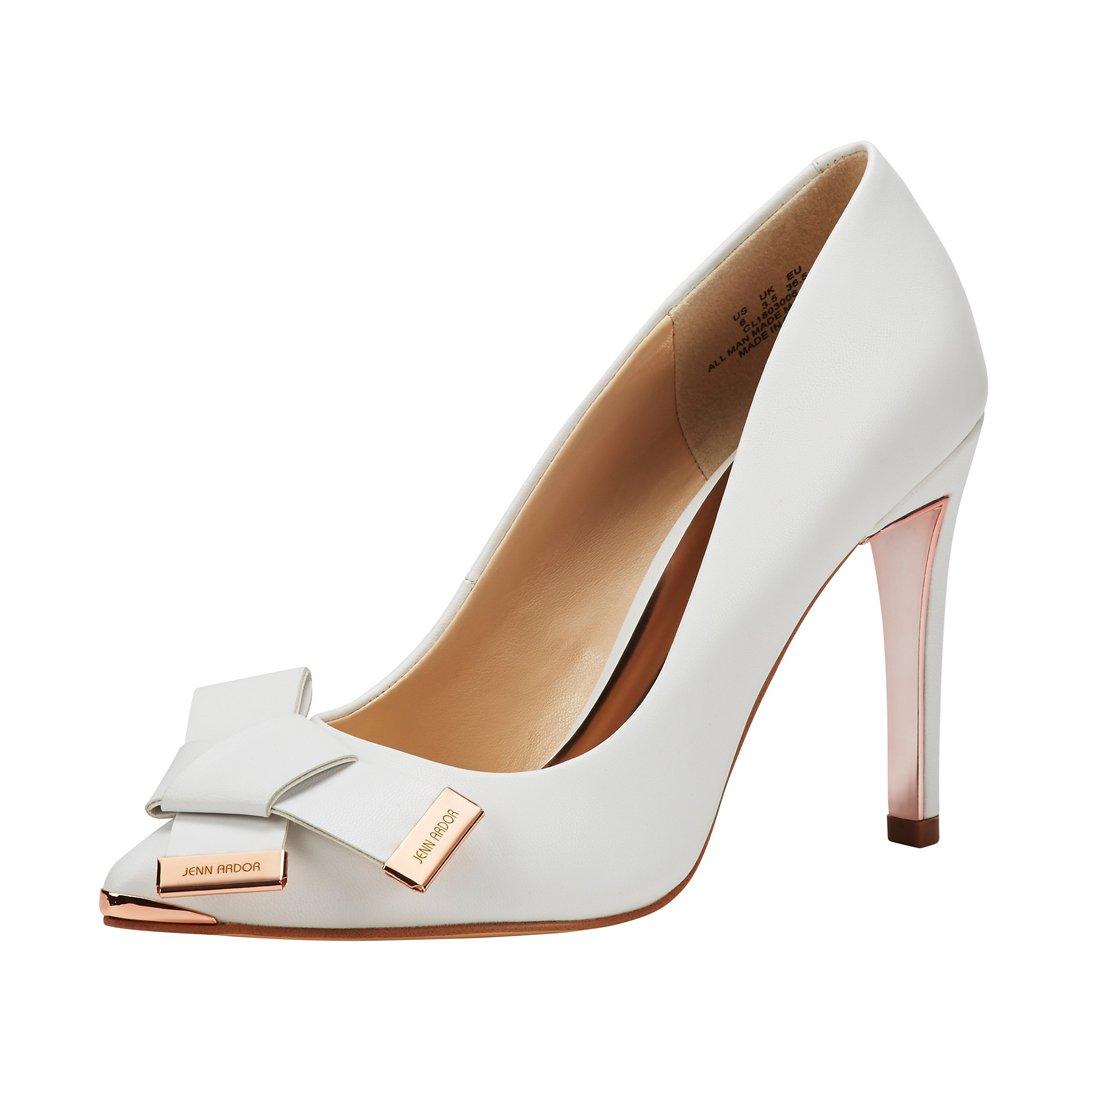 JENN ARDOR Women's Stiletto High Heel Pumps Pointy Toe Leather Bowknot Slip On Bridal Wedding Shoes White 10 B(M) US (26.38 CM)